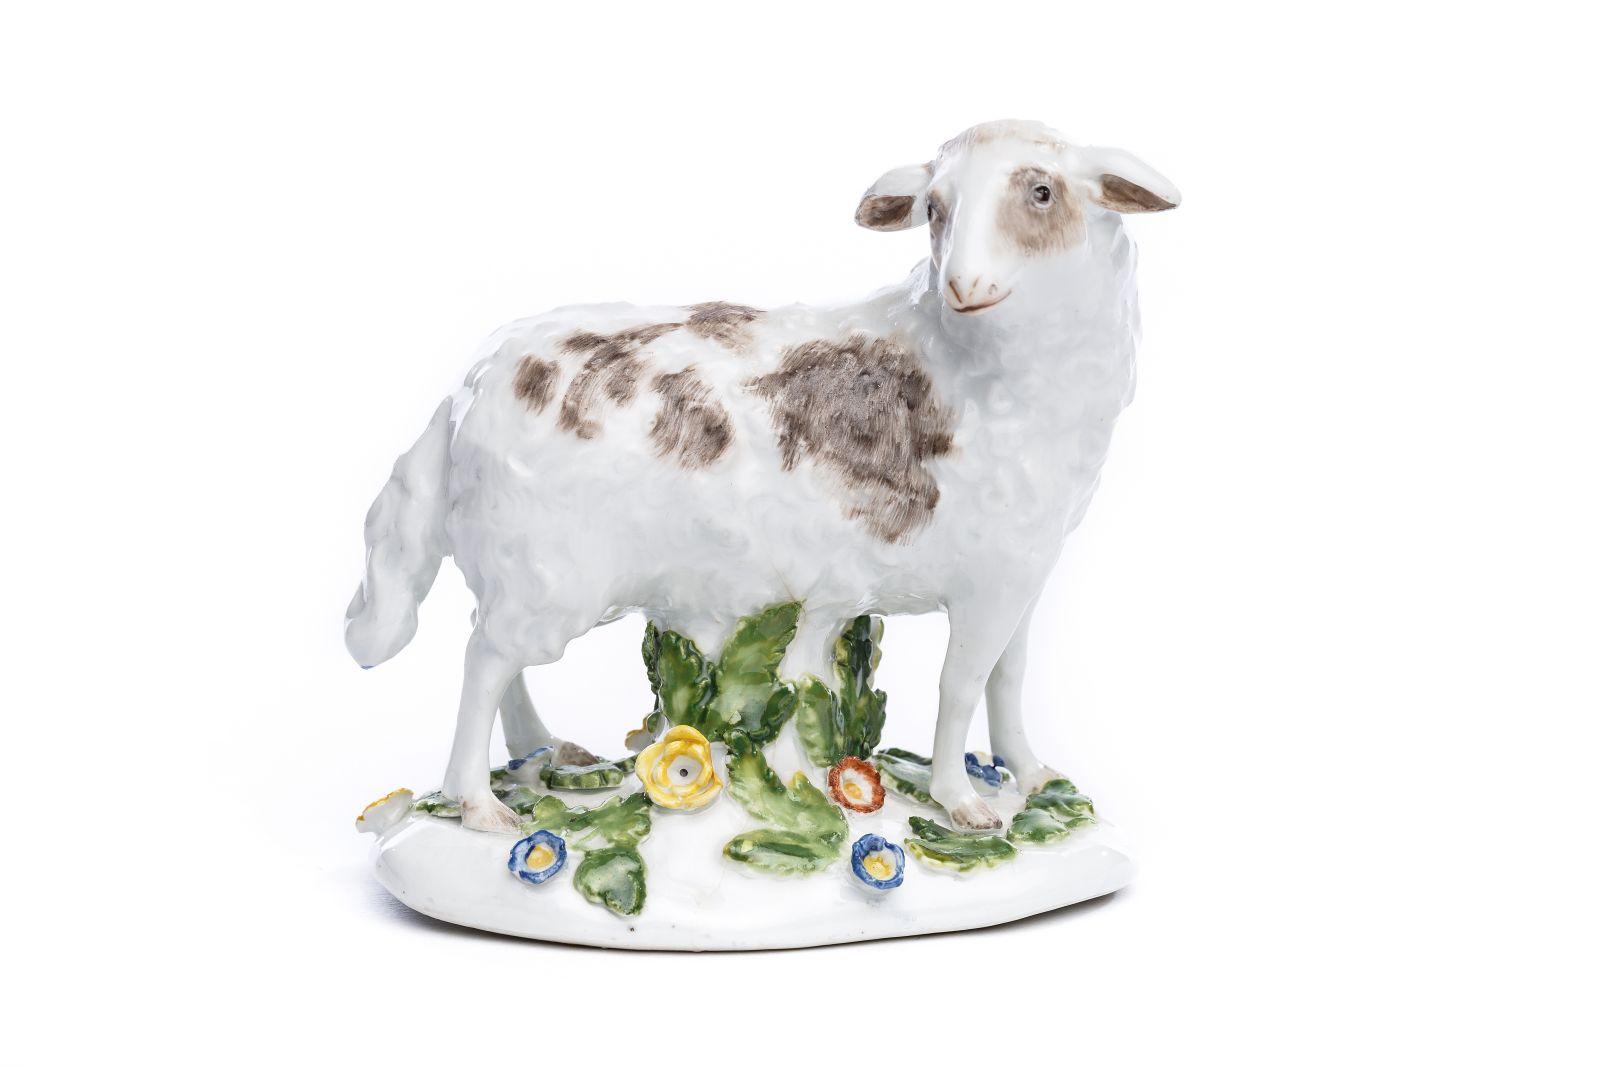 "#44 Porcelain figure ""Sheep"", Meissen 1750 | Porzellanfigur ""Schaf"", Meissen 1750 Image"